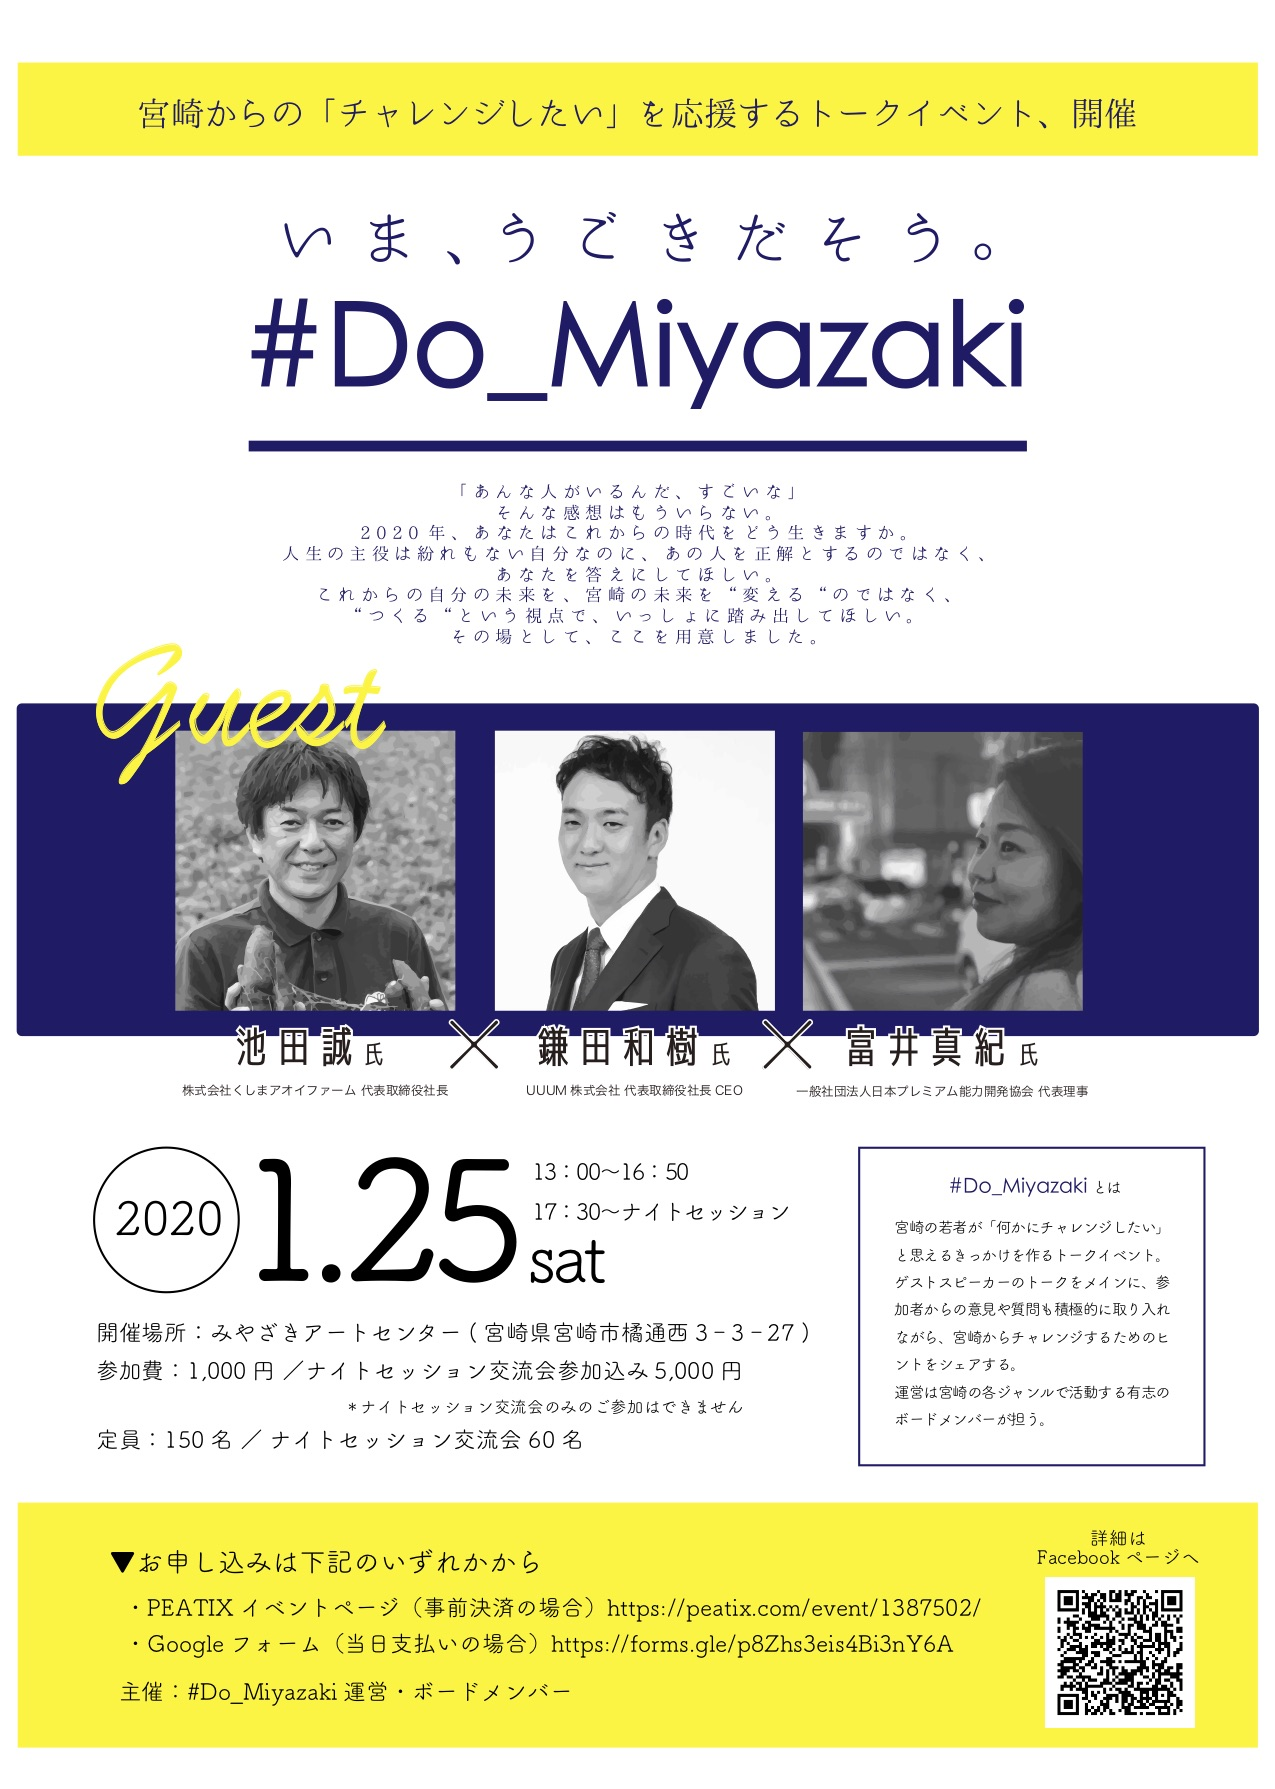 #Do_Miyazaki というイベントへ院長も参加しますのイメージ画像